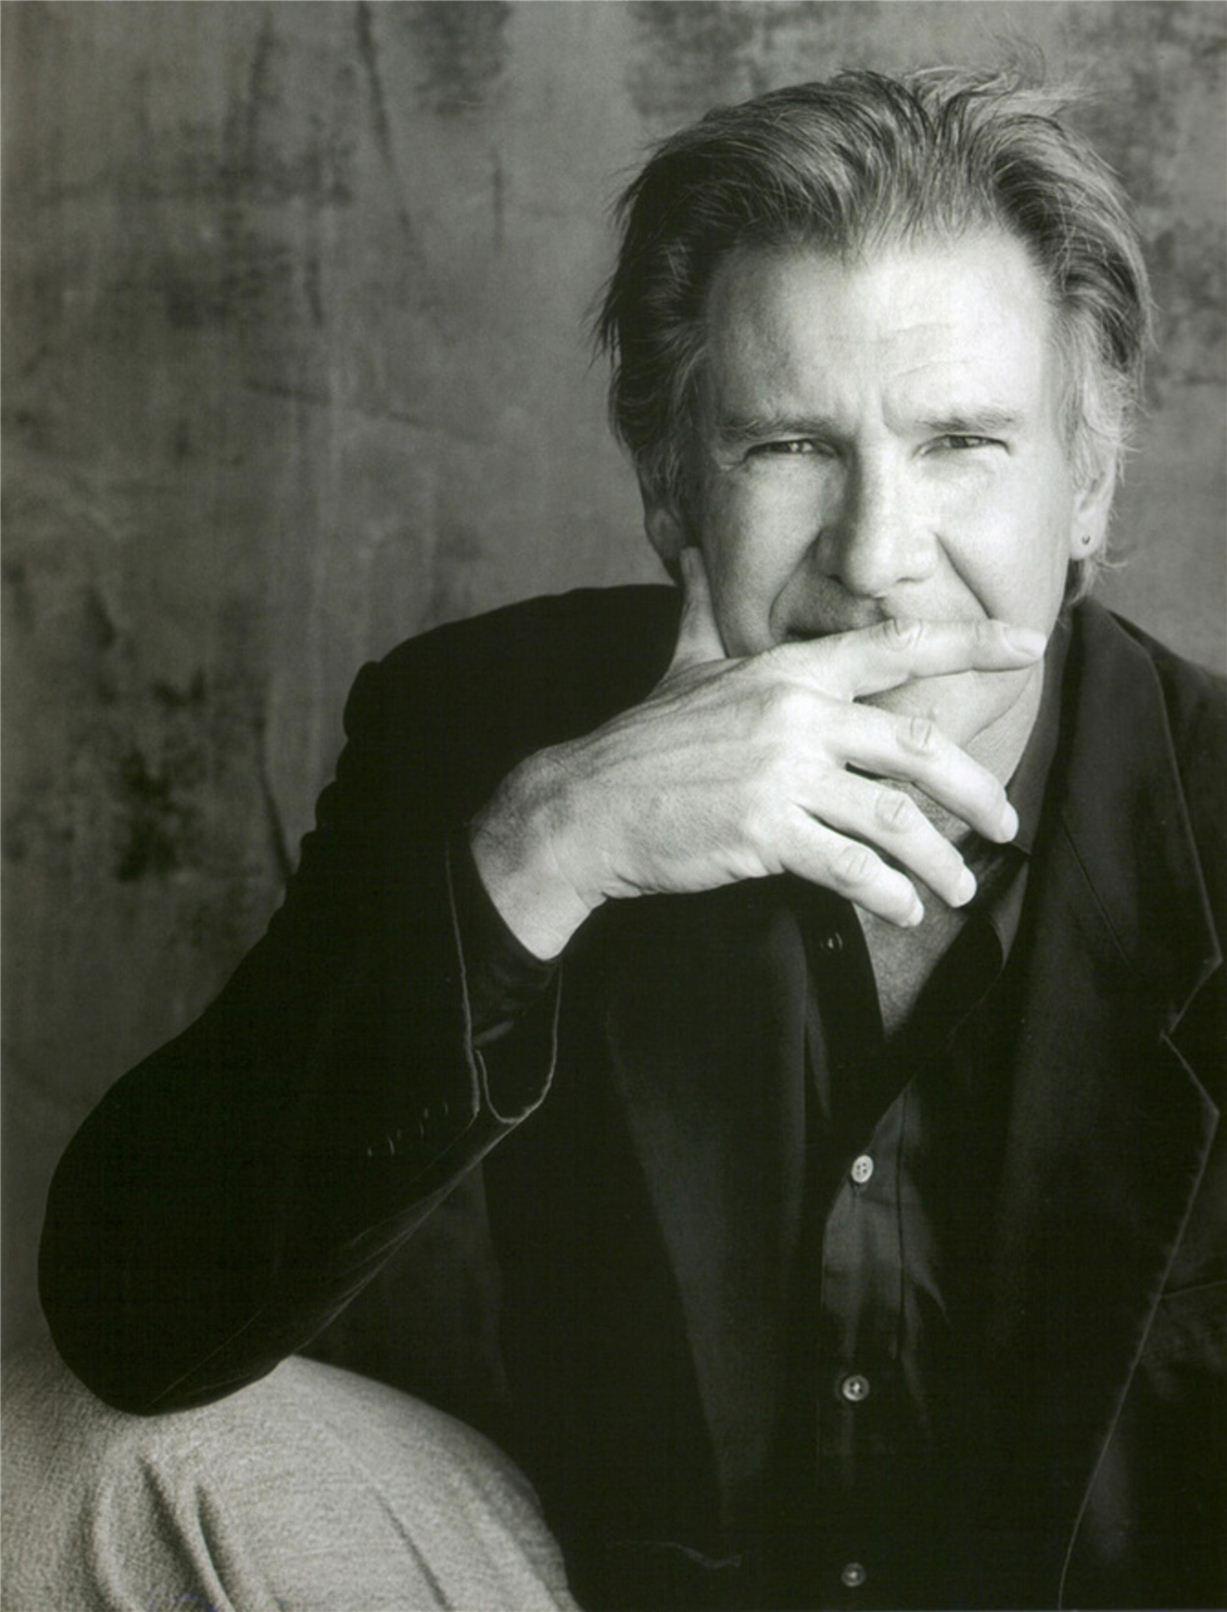 Harrison Ford / Харрисон Форд - портрет фотографа Грега Гормана / Greg Gorman